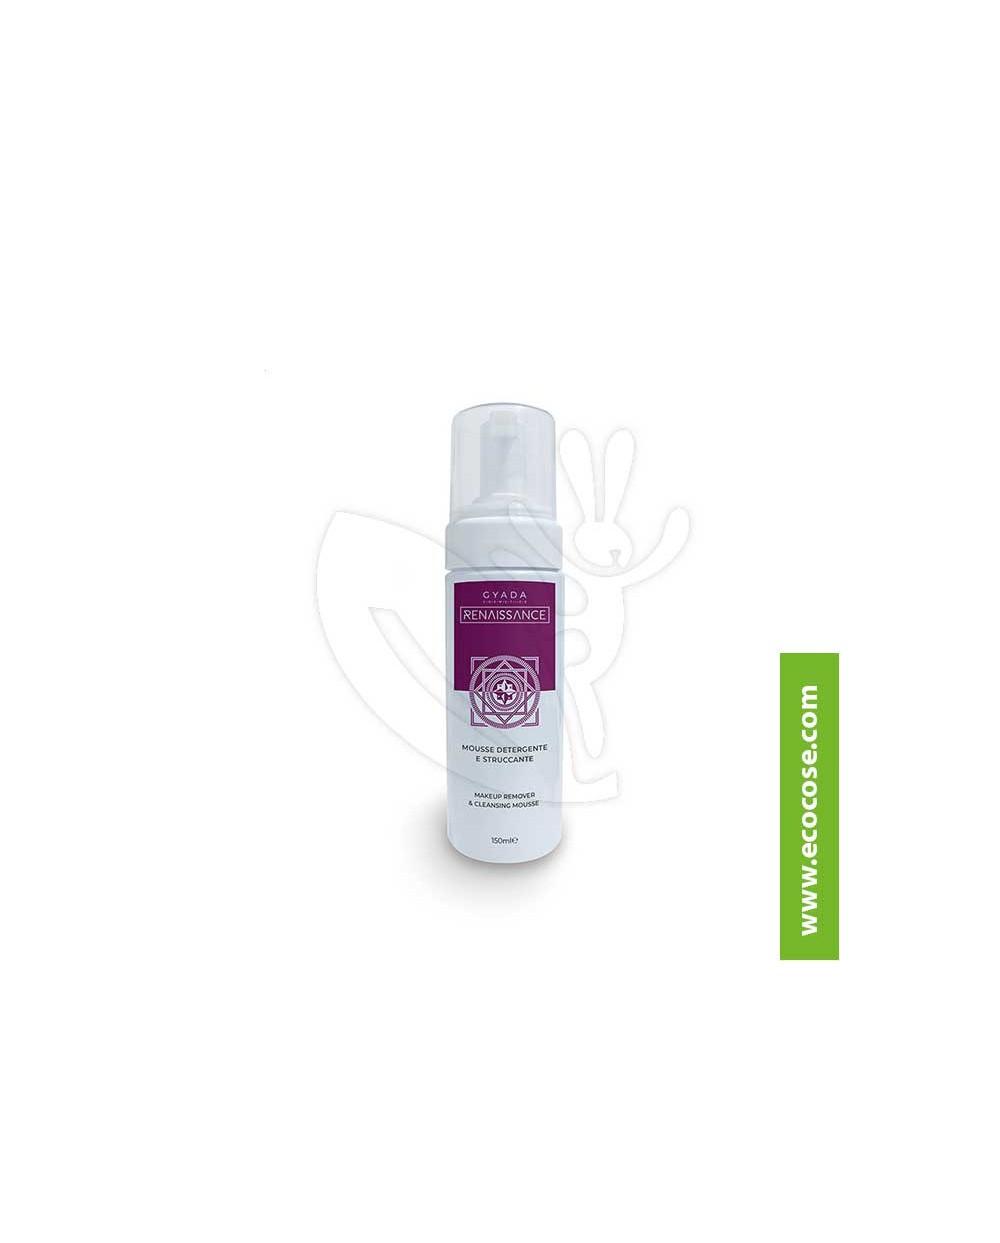 Gyada Cosmetics - Mousse detergente e struccante